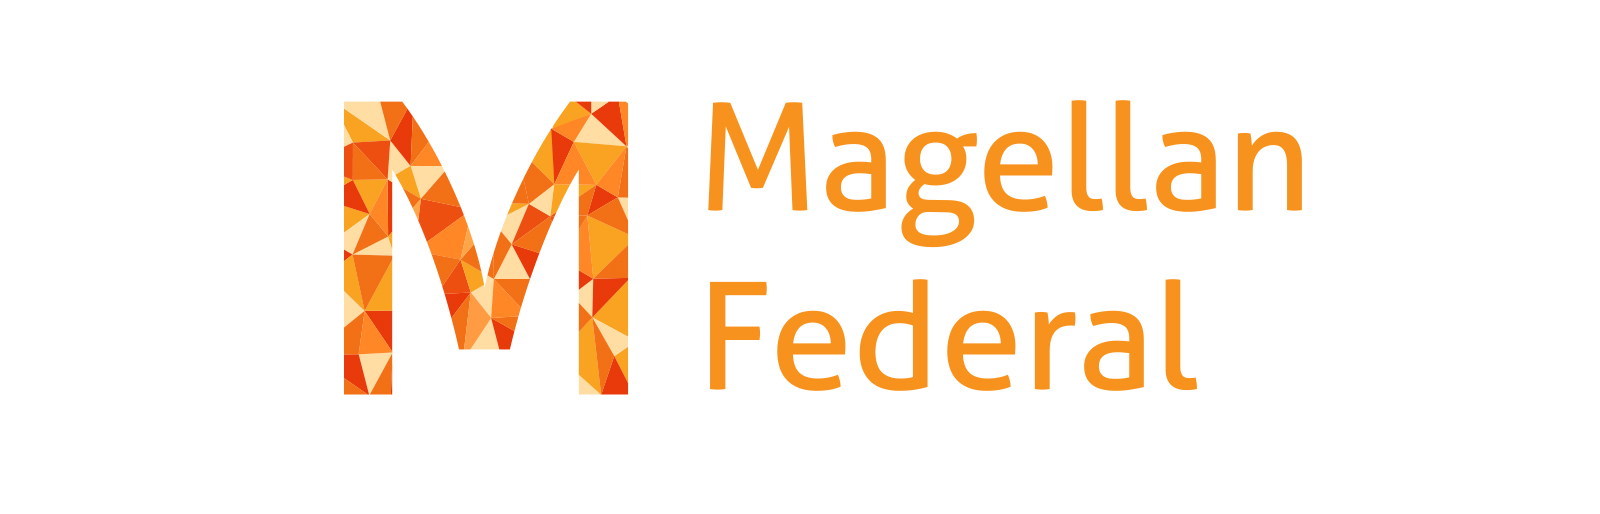 Magellan Federal | Magellan Health